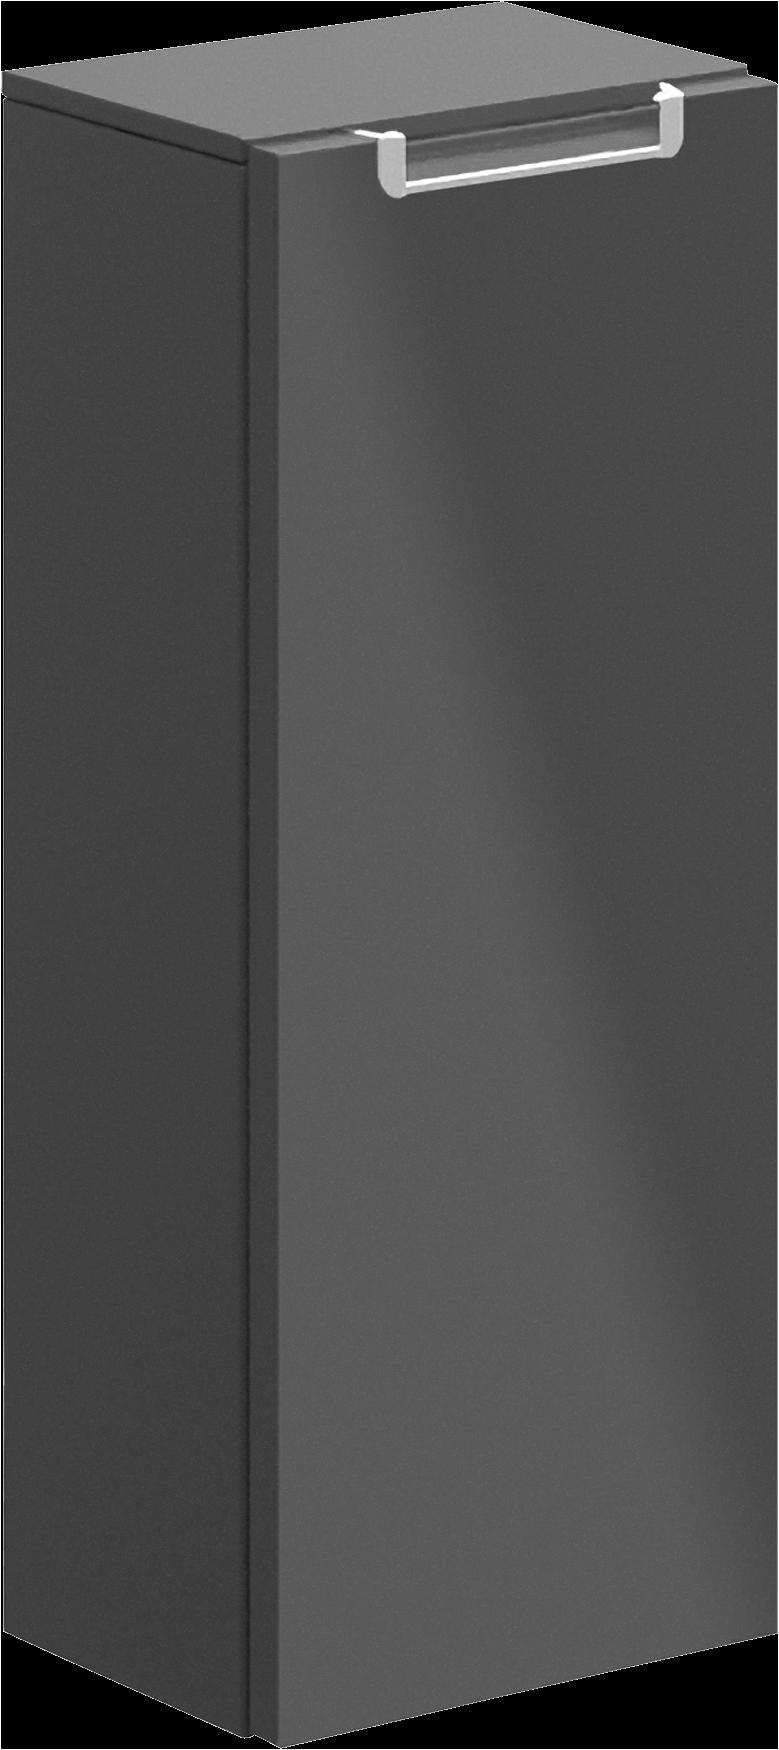 Subway 2 0 Bathroom furniture  Cabinet  Bathroom cabinets. Subway 2 0 Side cabinet A8200R   Villeroy   Boch